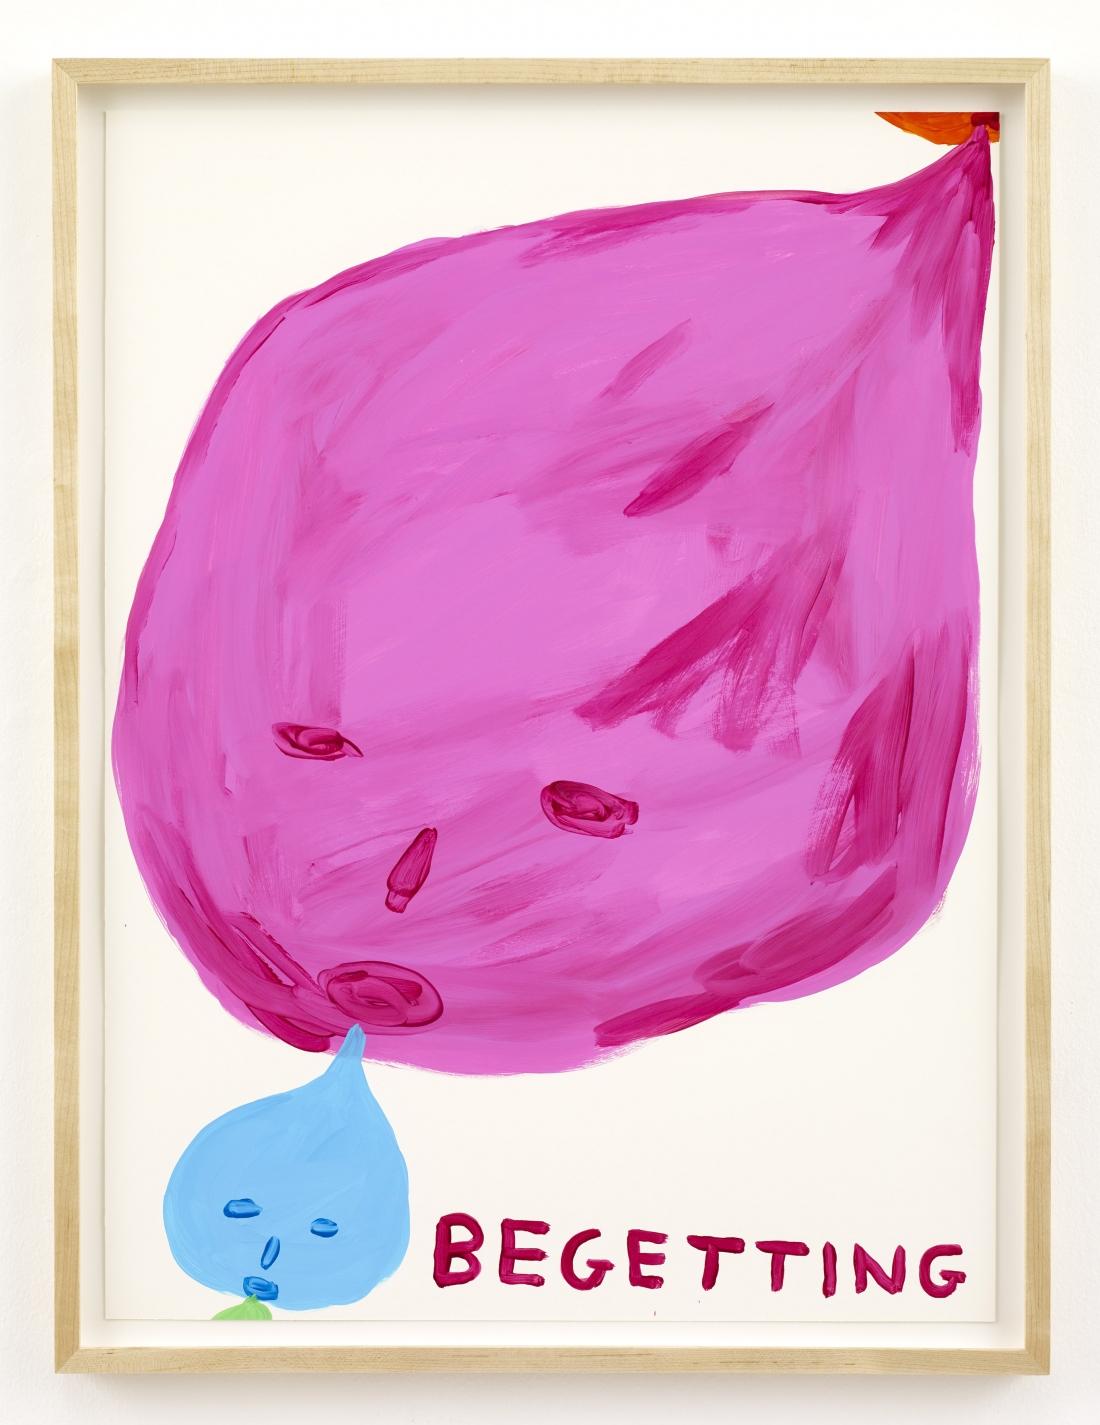 Copyright: David Shrigley. Courtesy of David Shrigley and Stephen Friedman Gallery, London.